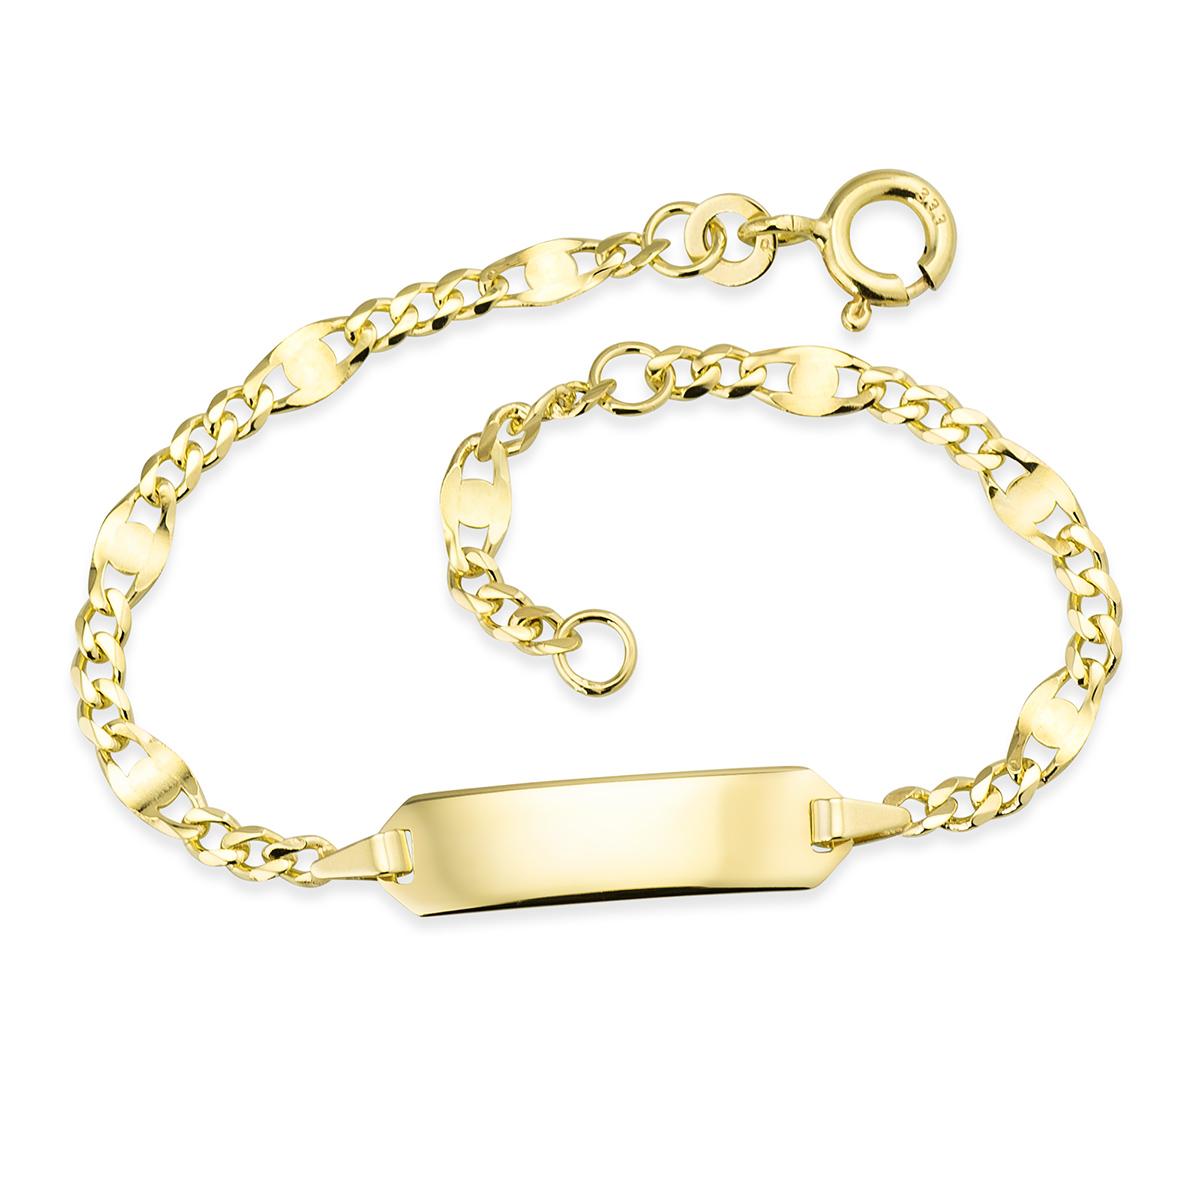 Materia Mädchen Armband Mit Gravur 333 Gold Armkette 12 14cm